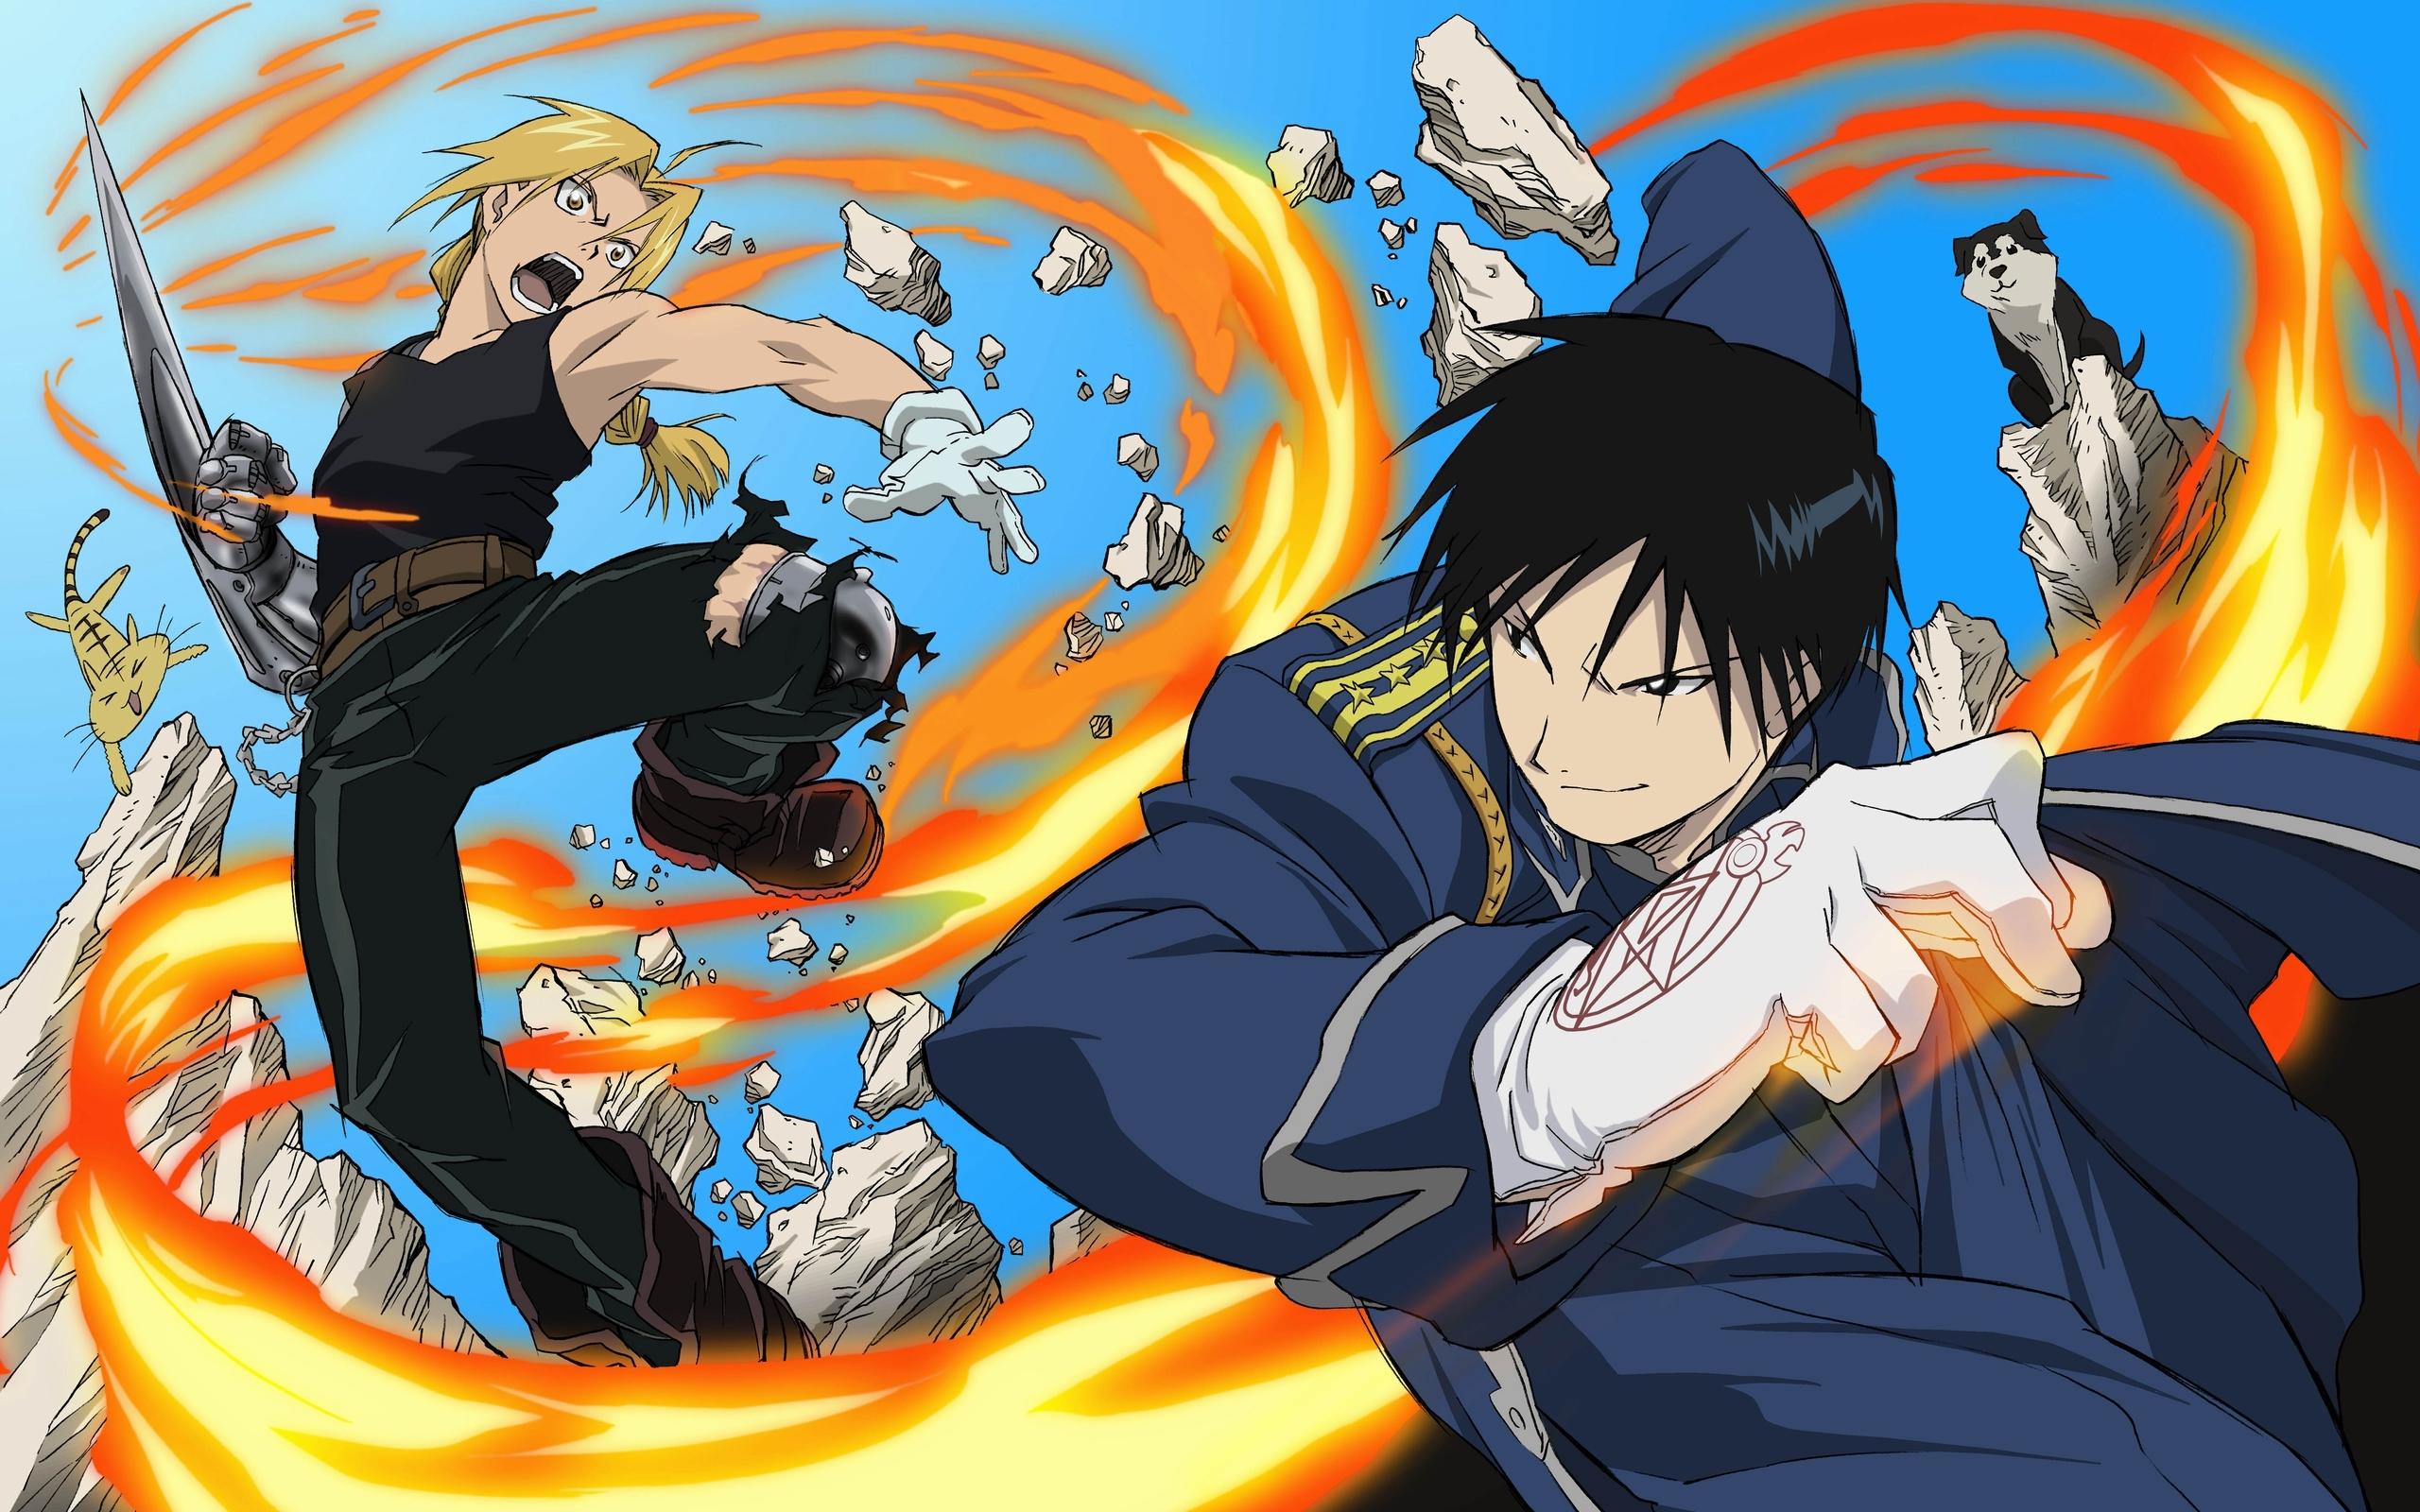 Wallpaper Anime Boys Fight Fire Jump 2560x1600 1094209 Hd Wallpapers Wallhere